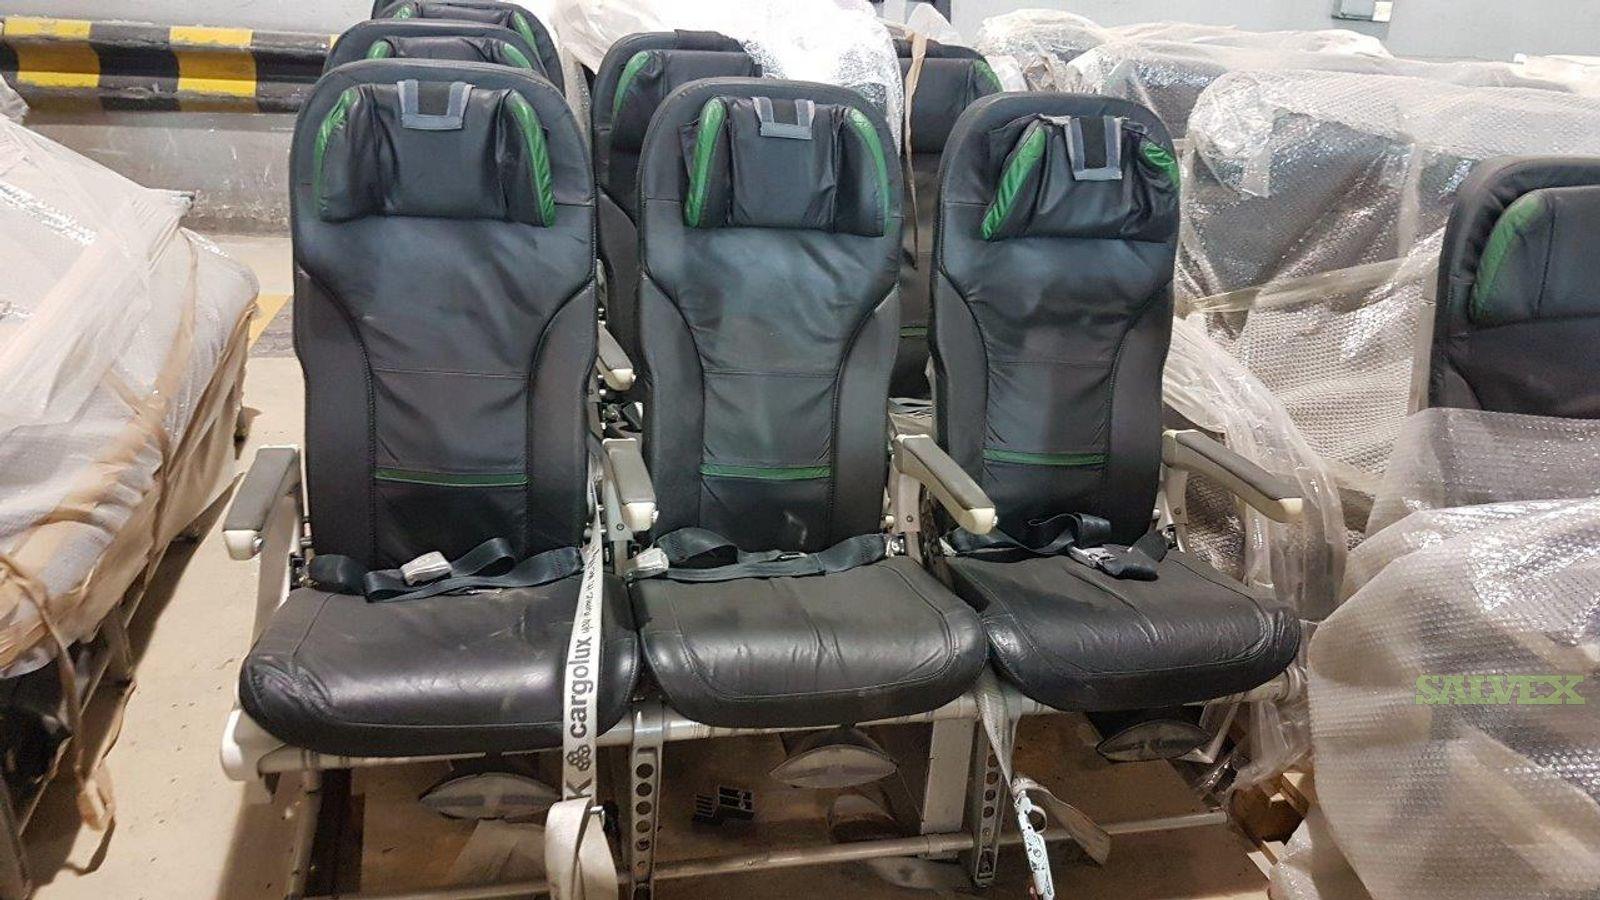 Removed A320 Economy Class Seats / EO320-25-291 (56 Seats)